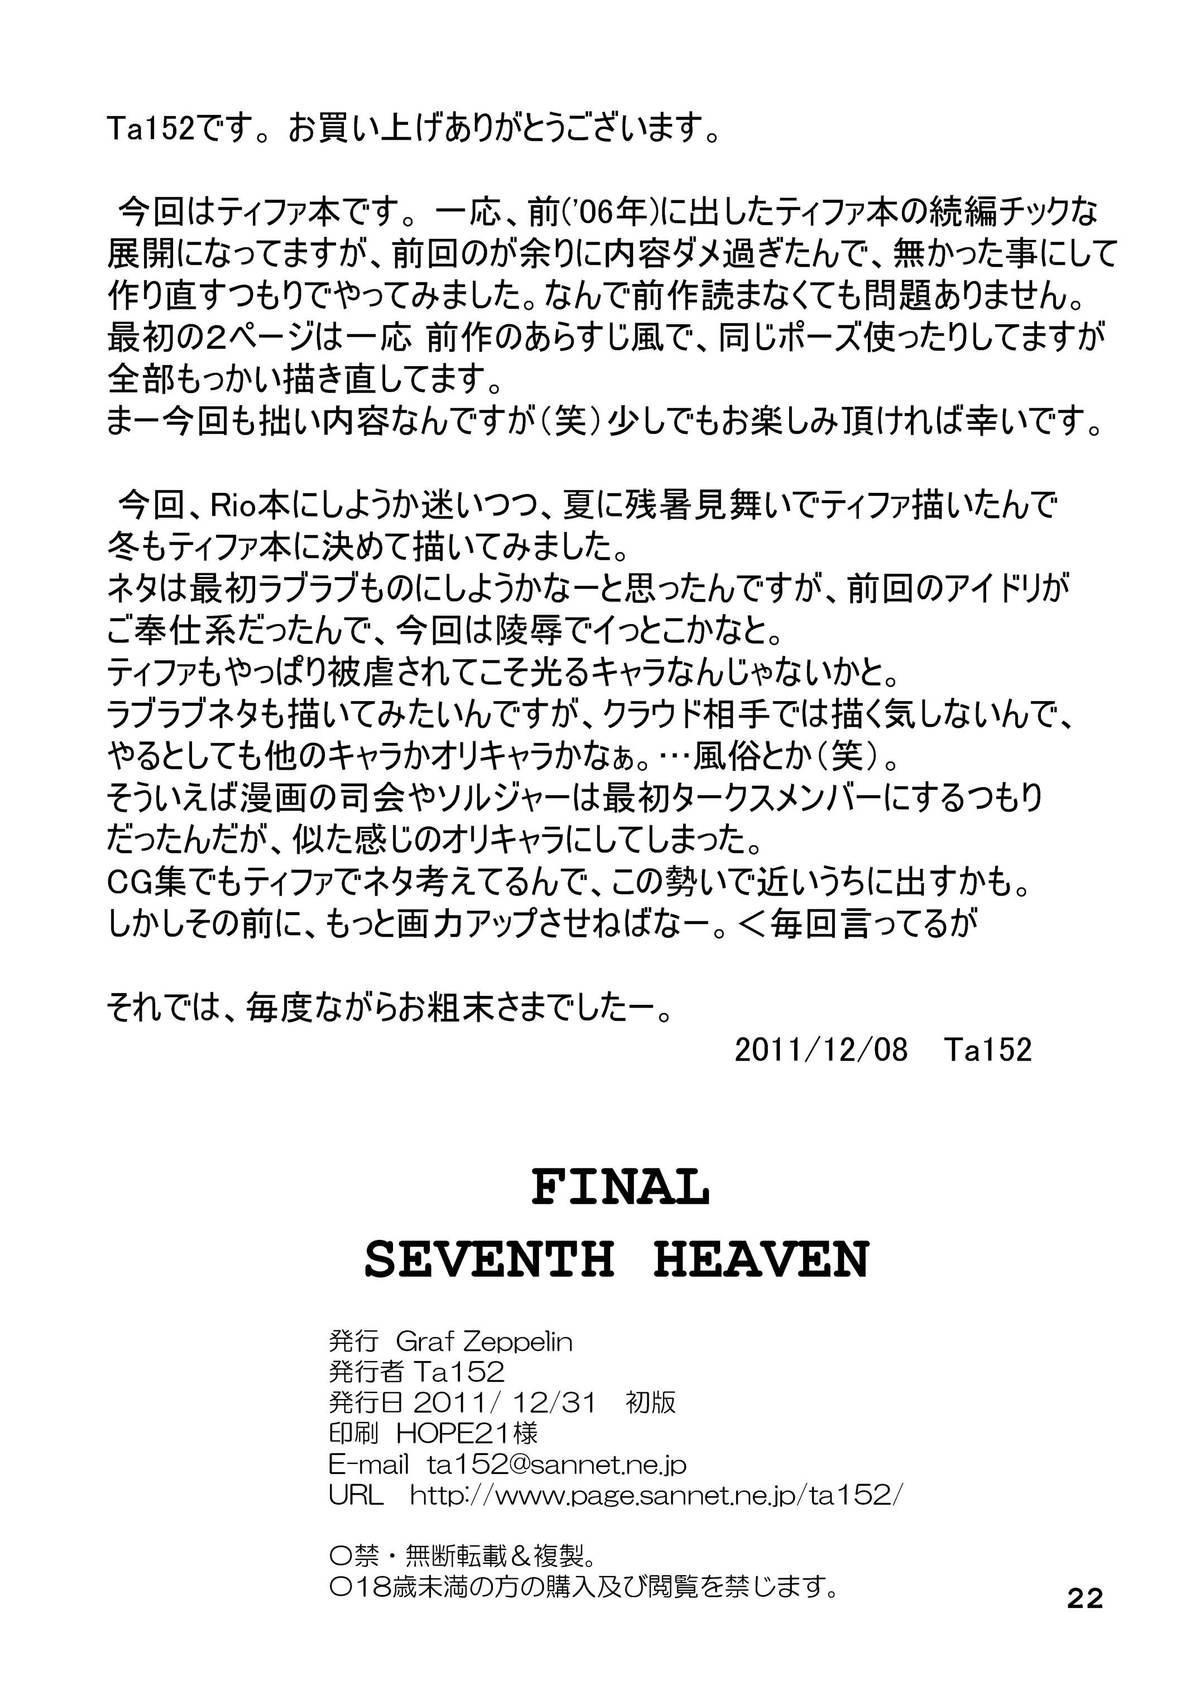 Final Seventh Heaven 20